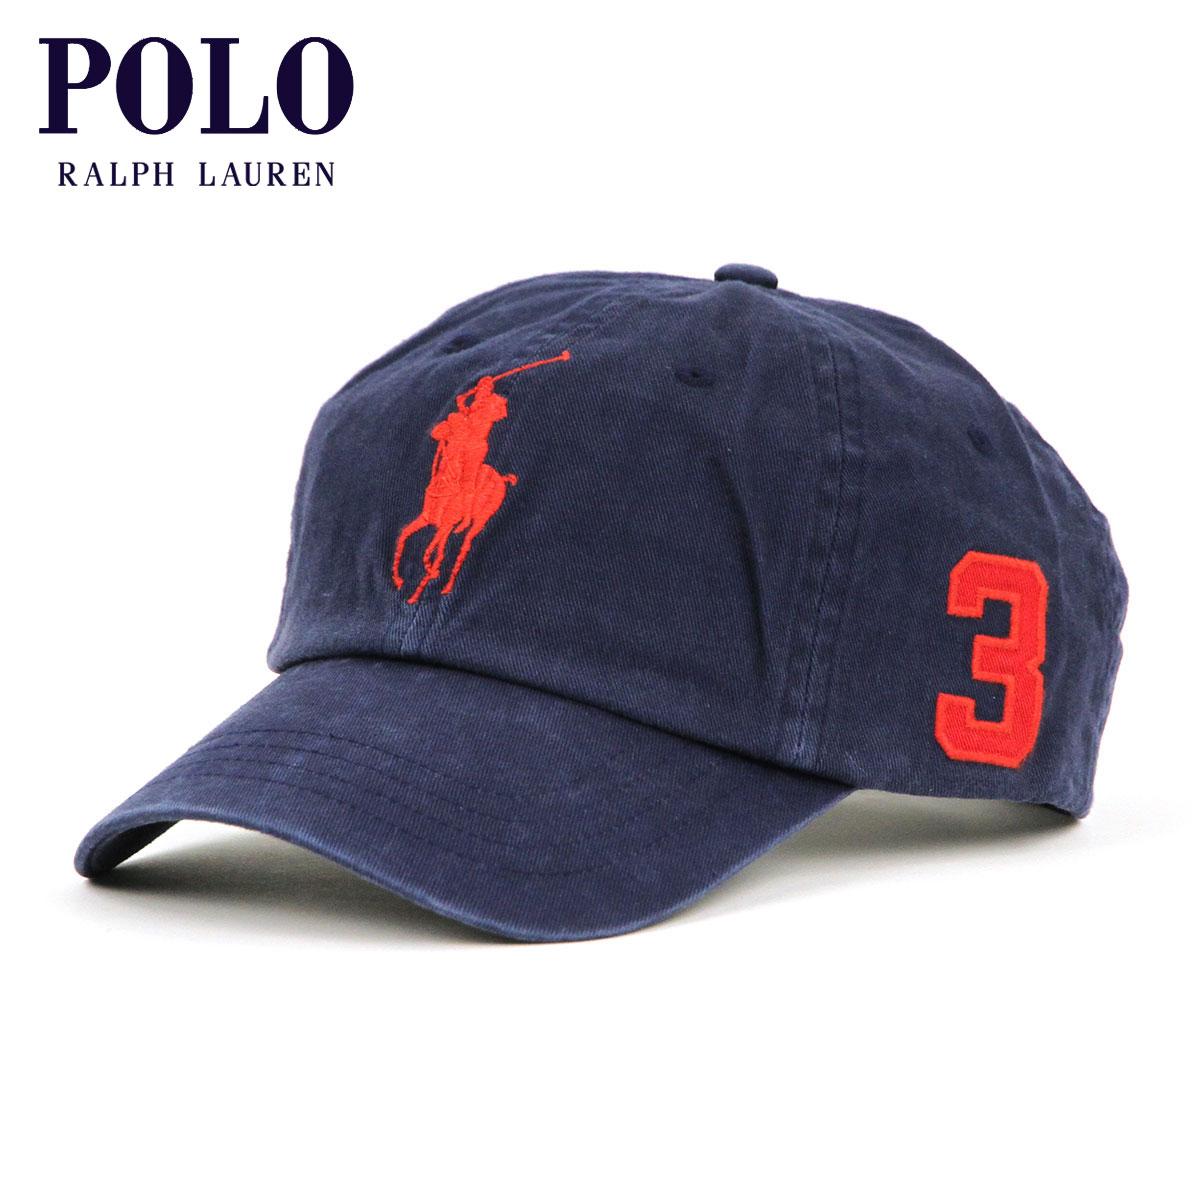 c4e09e7283 Polo Ralph Lauren cap men's regular article POLO RALPH LAUREN hat Big Pony  Hat NAVY D00S20